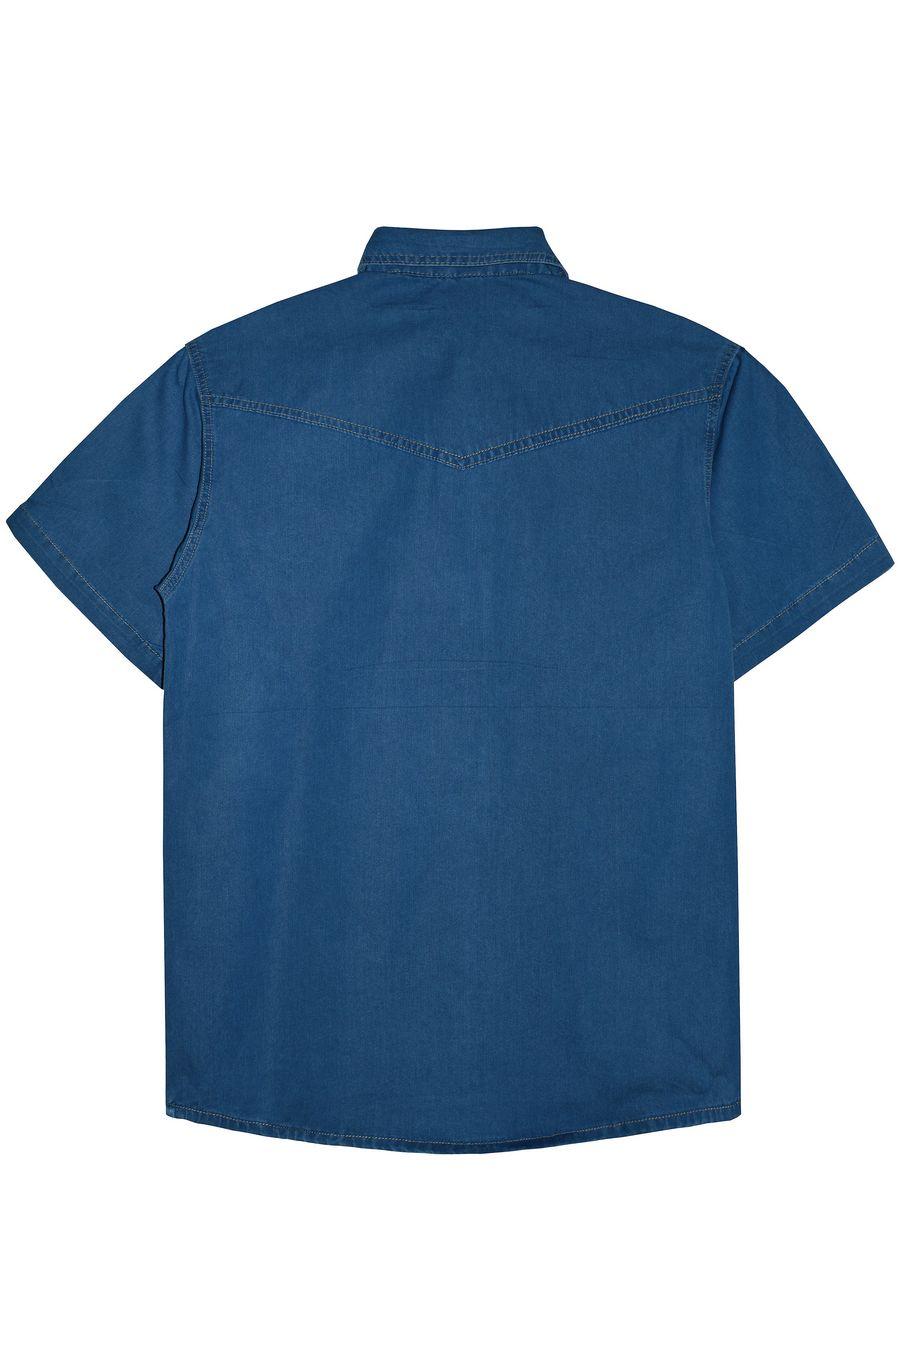 Рубашка мужская Vicucs 728E/CT-321-19 (S-2XL) - фото 2